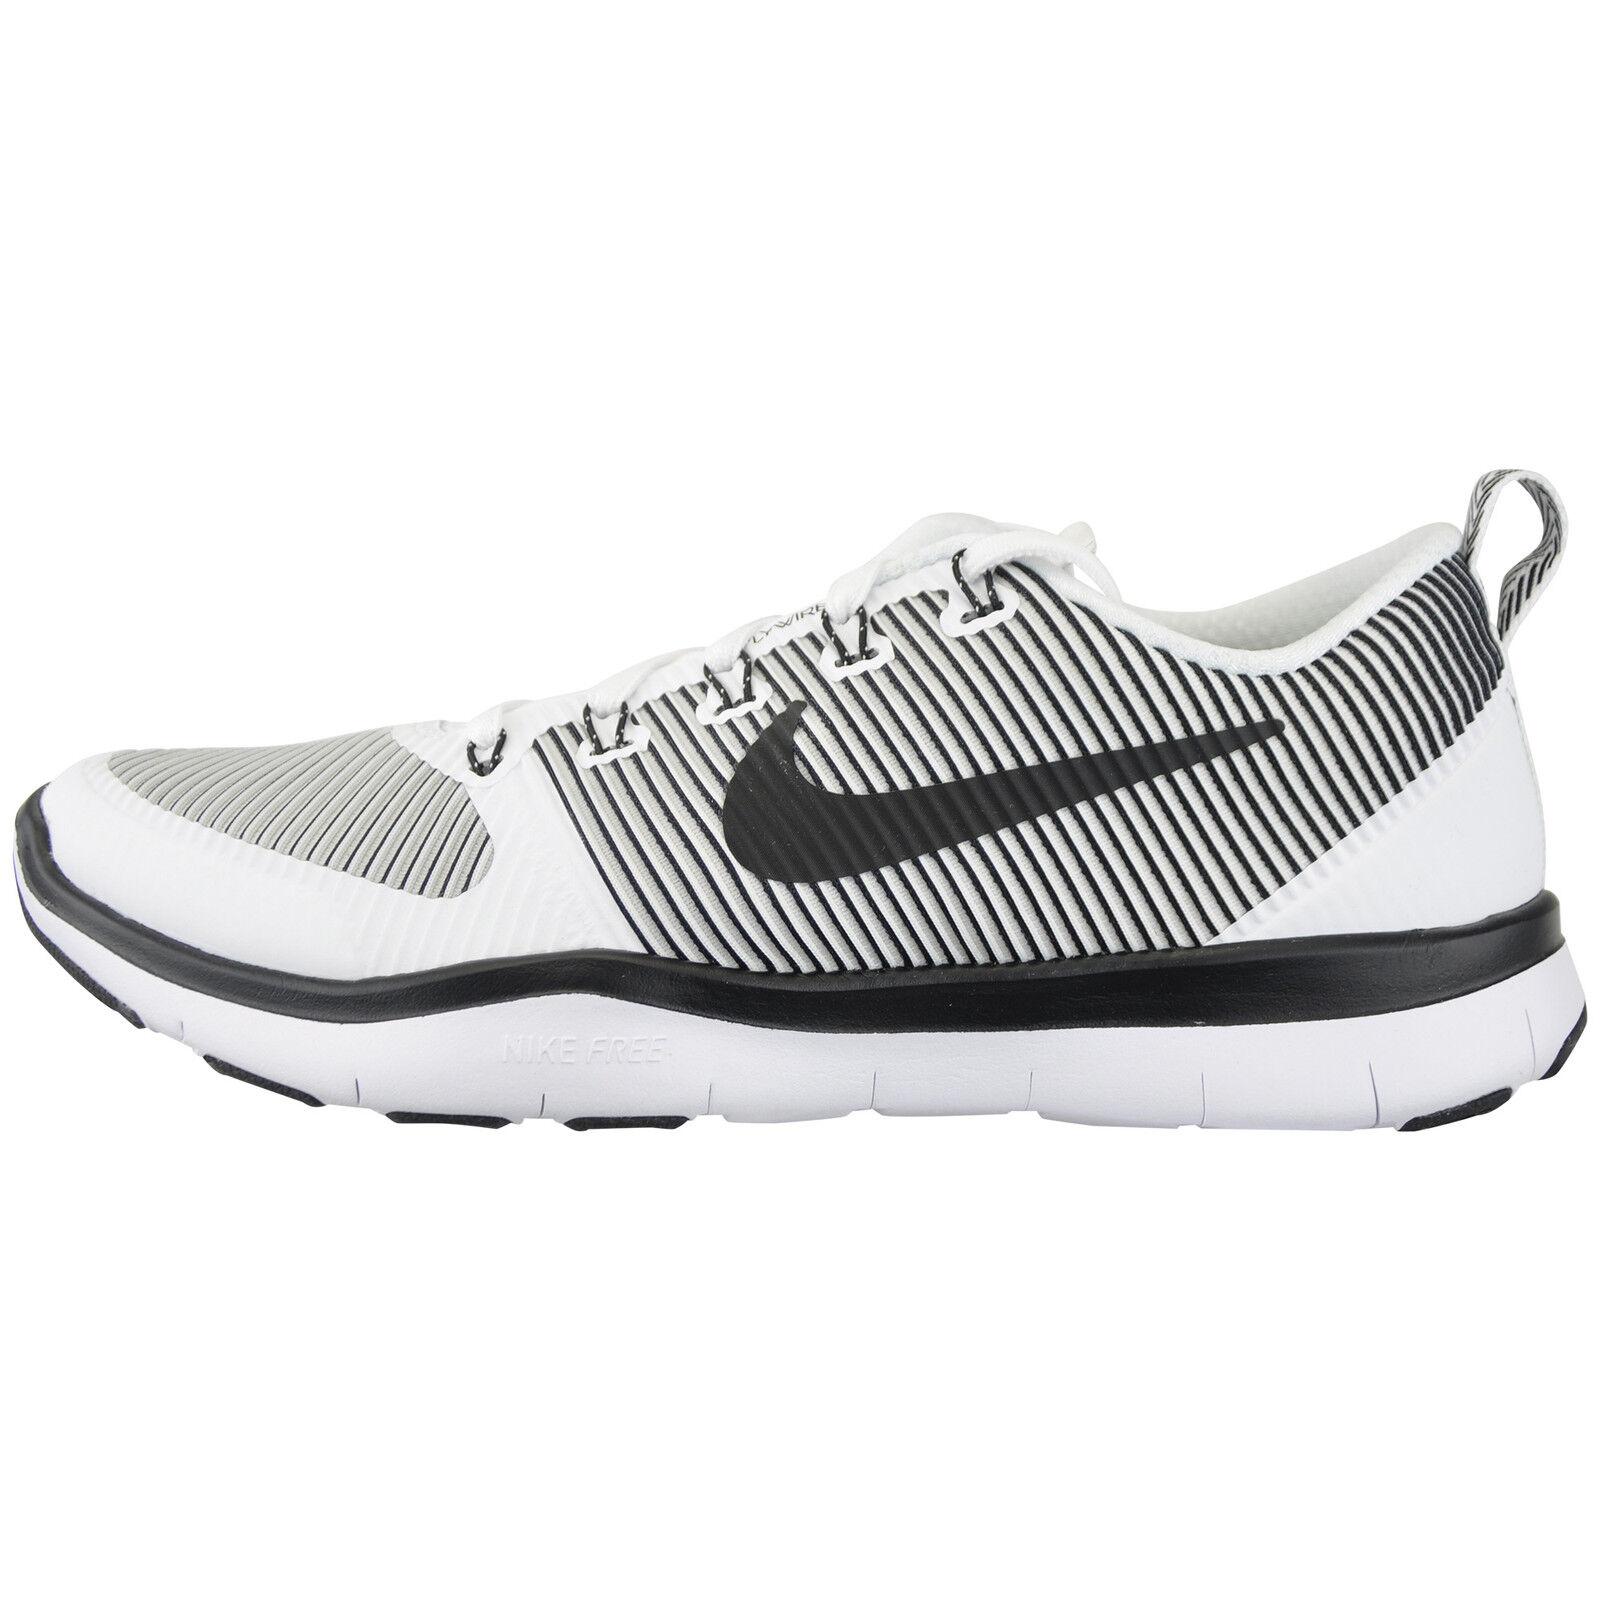 Nike Free Train Versatility 833258-100 833258-100 833258-100 Jogging scarpe da ginnastica Casual Scarpe da Corsa bc88ef